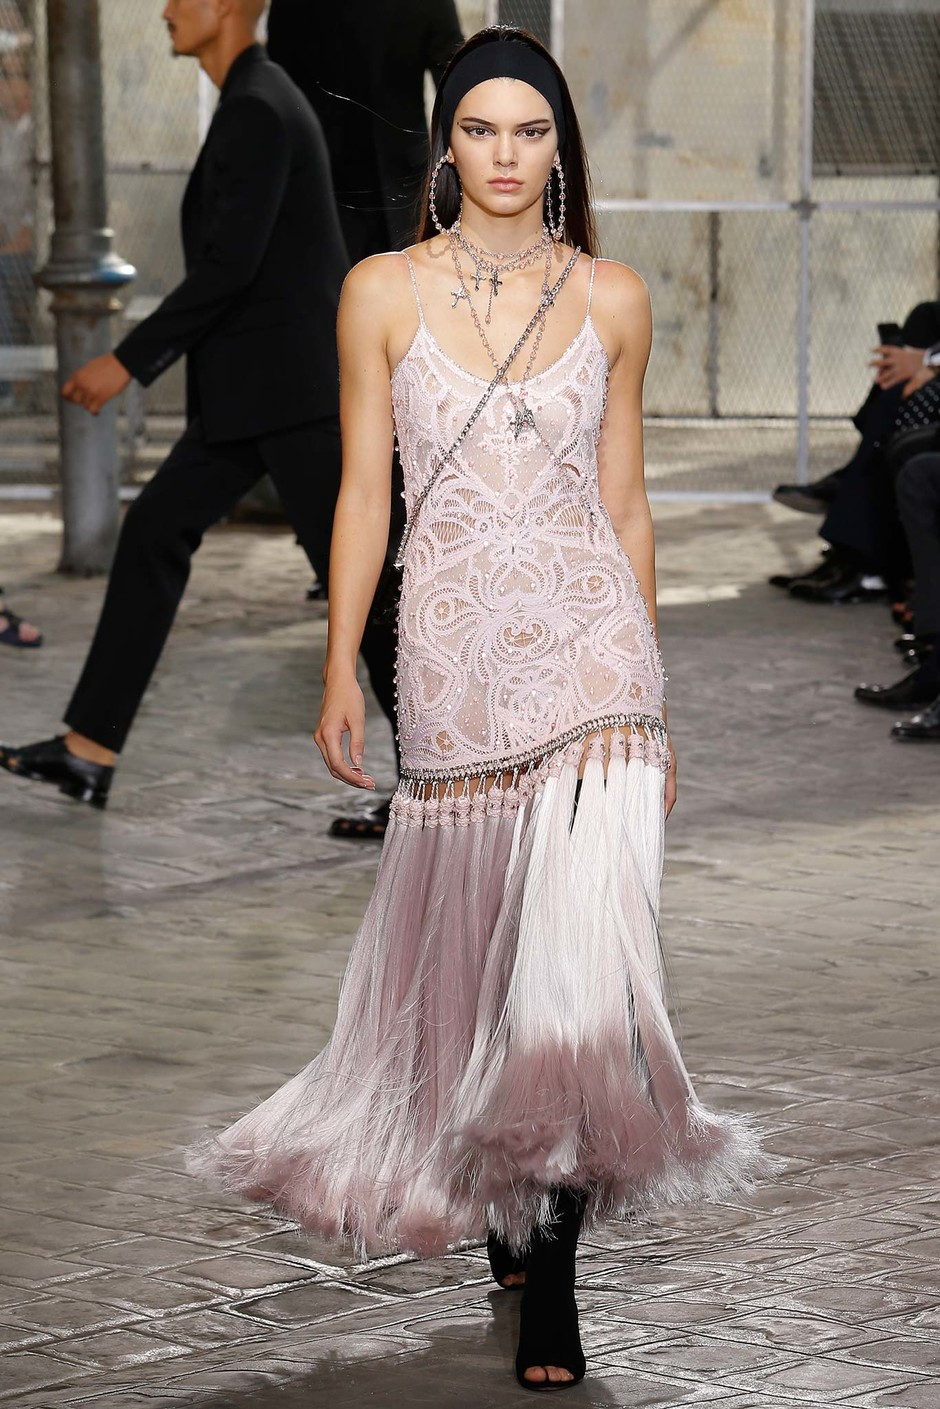 Кендалл Дженнер на показе Givenchy весна-лето 2016